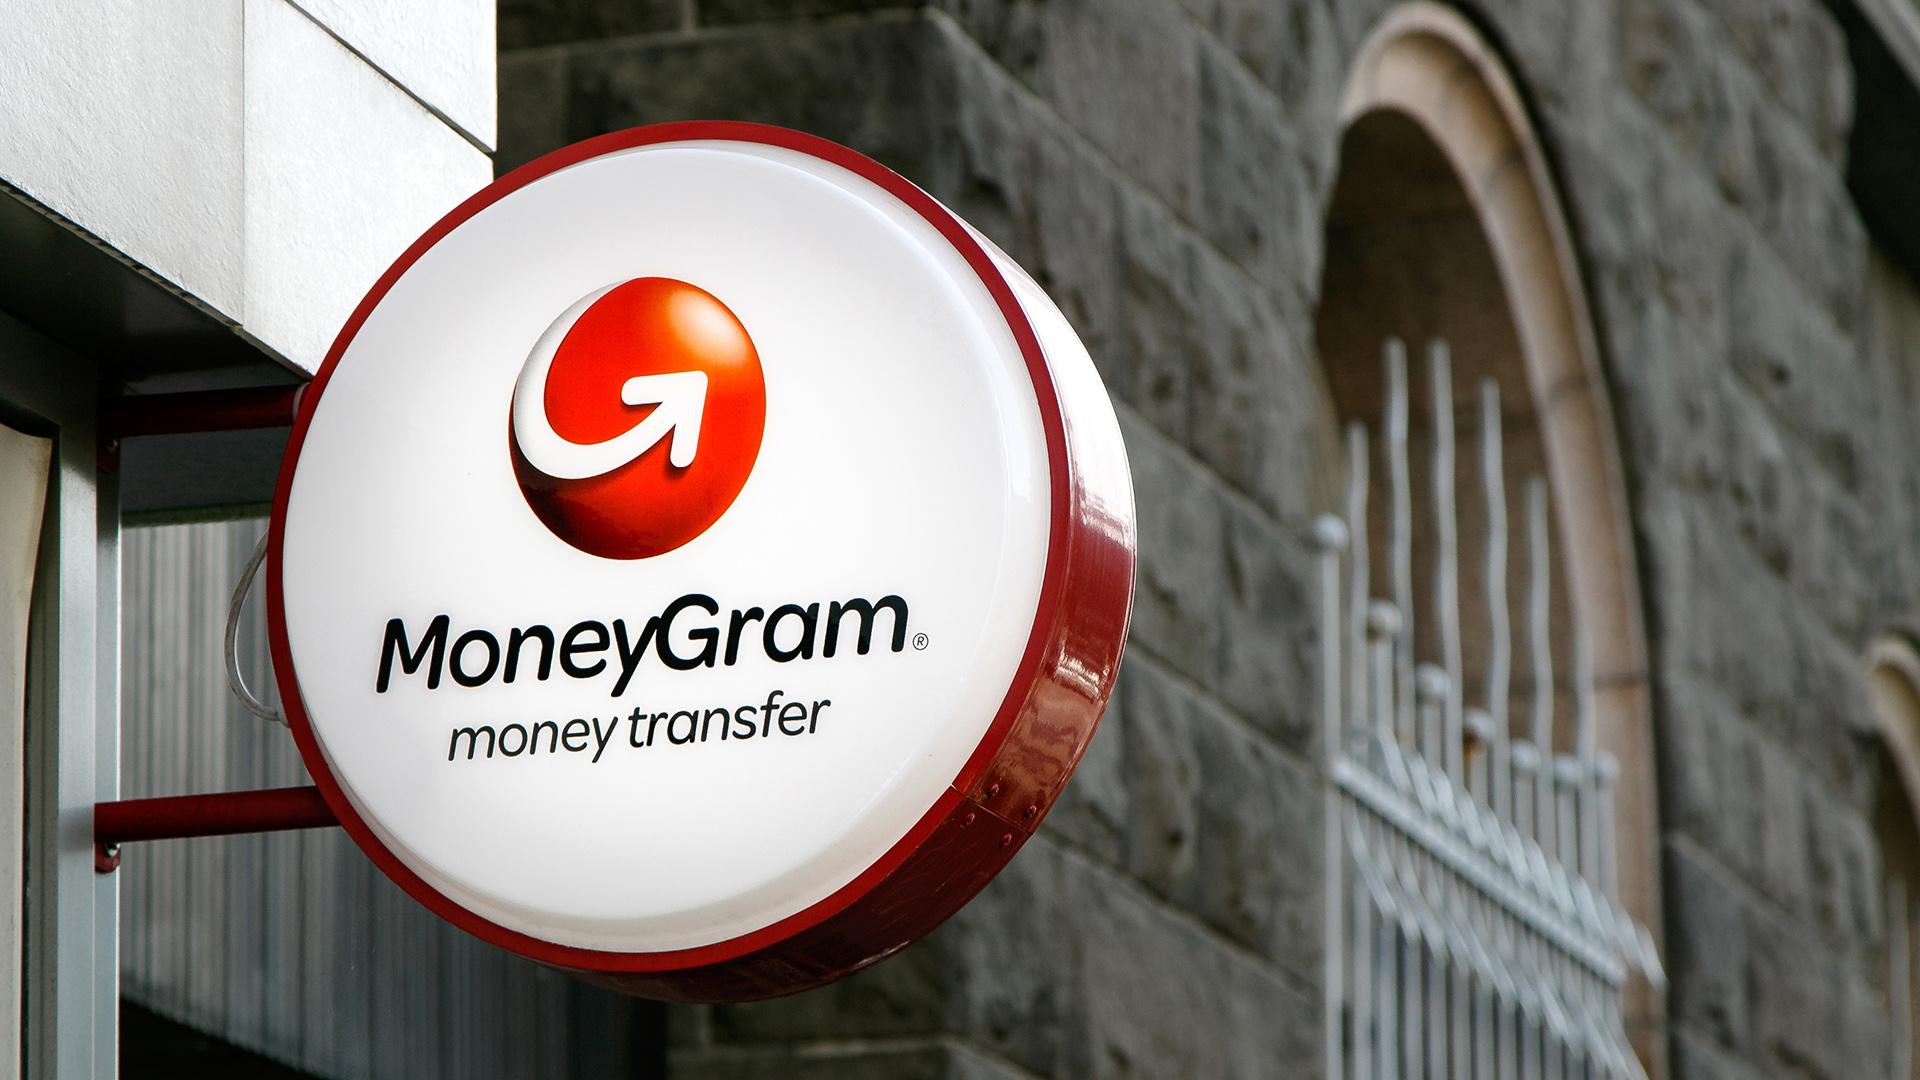 moneygram ripple xrp